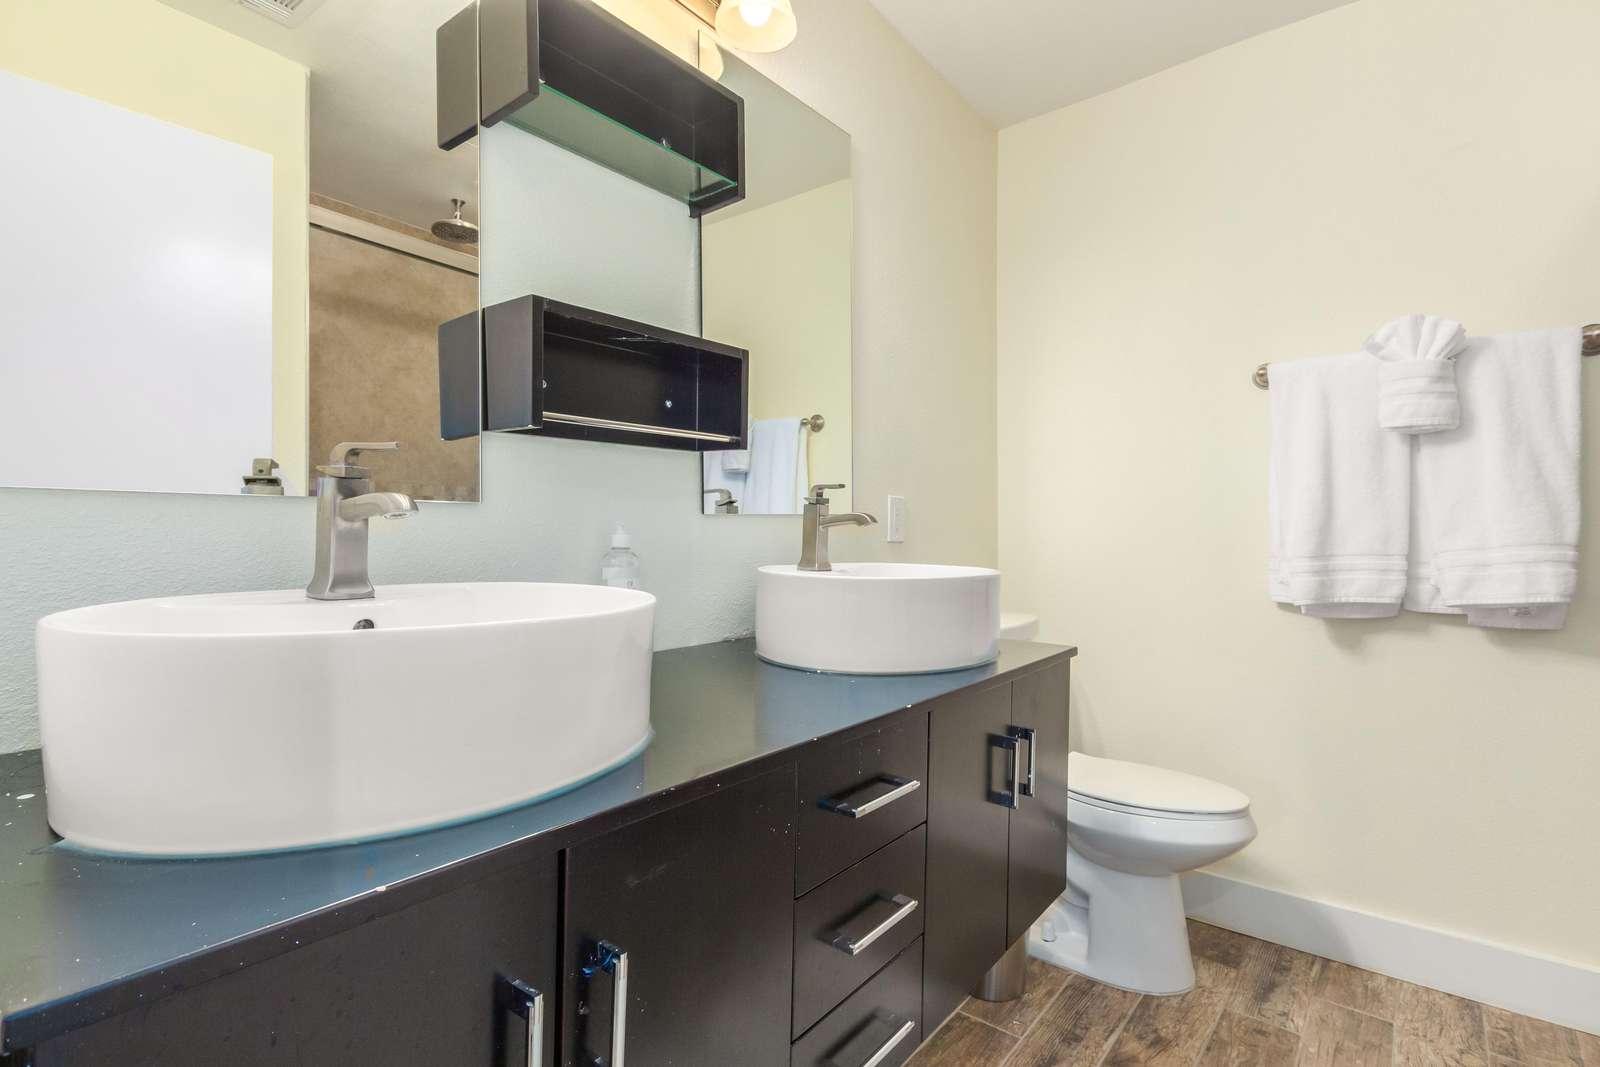 2nd Primary bathroom with double vanity